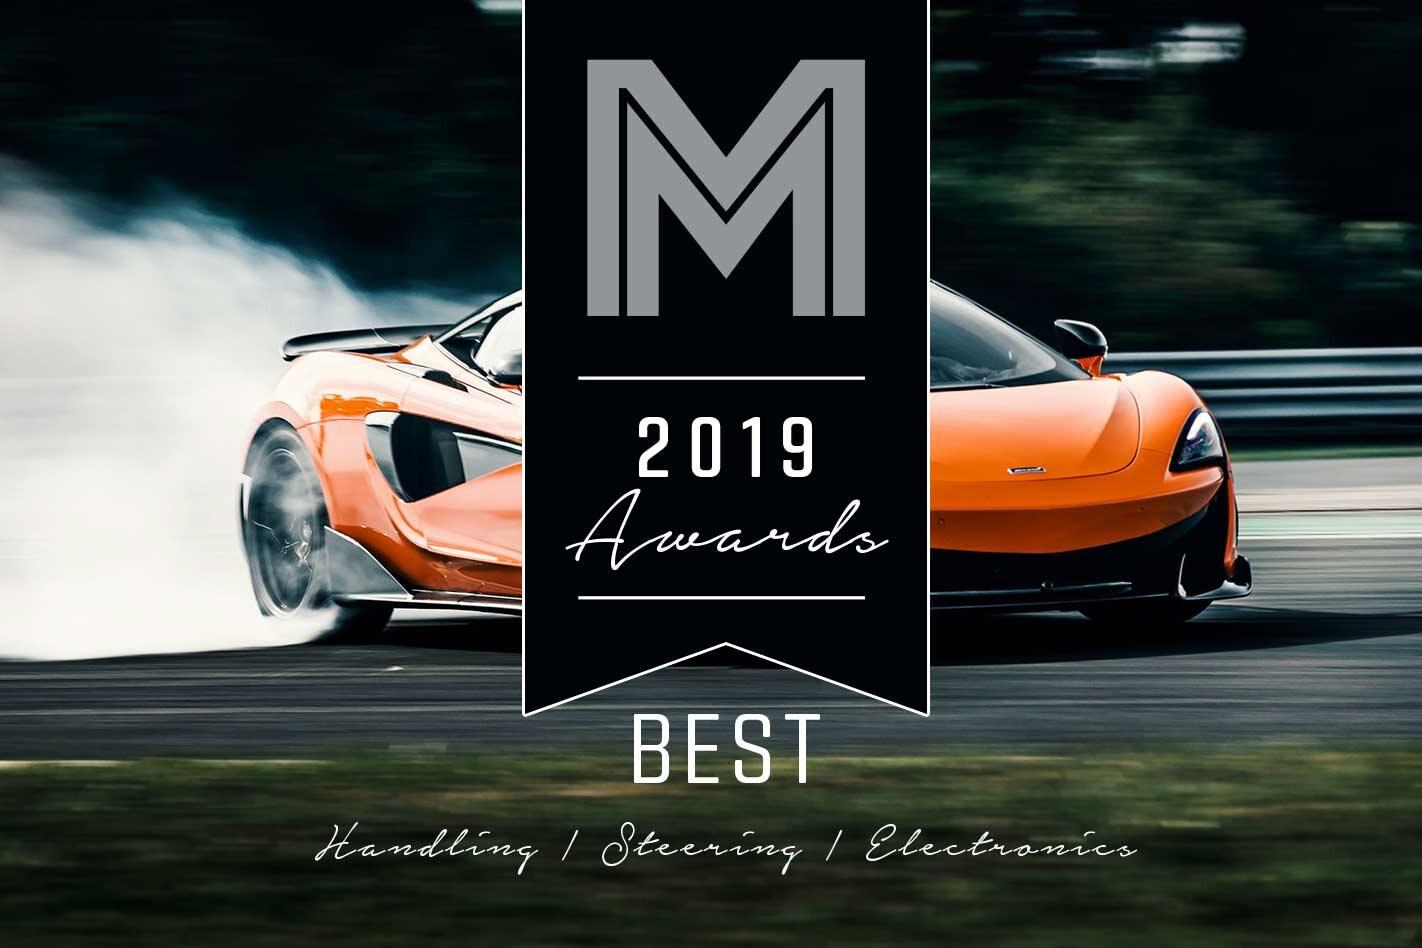 2019 MOTOR Awards Best Handling